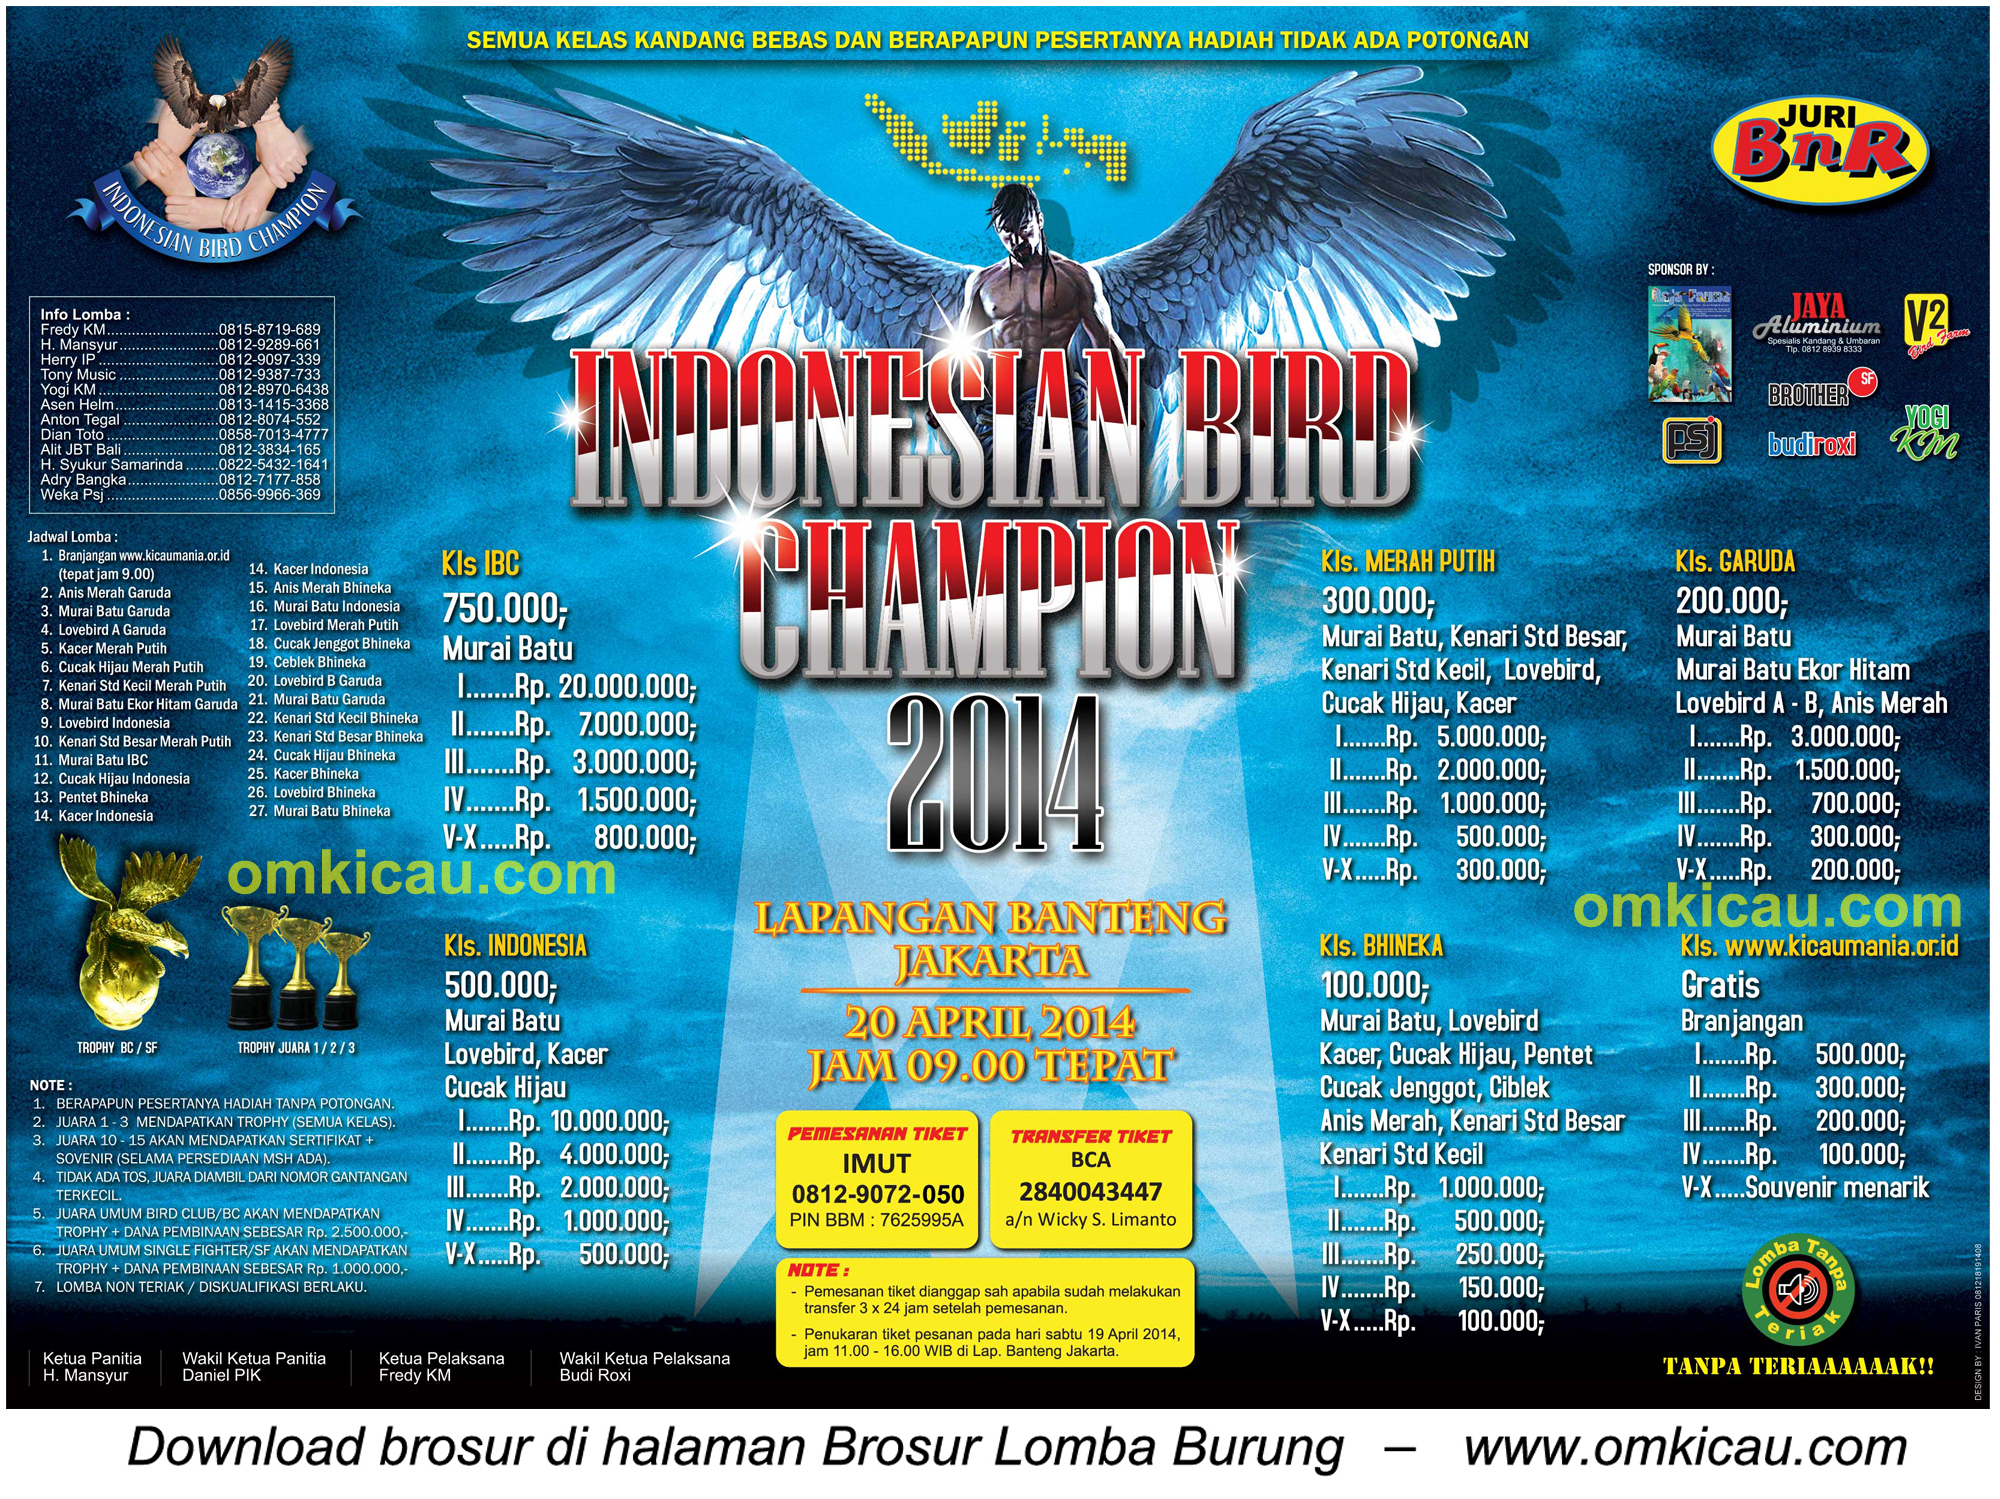 Brosur Lomba Burung Berkicau IBC Cup - Jakarta, 20 April 2014